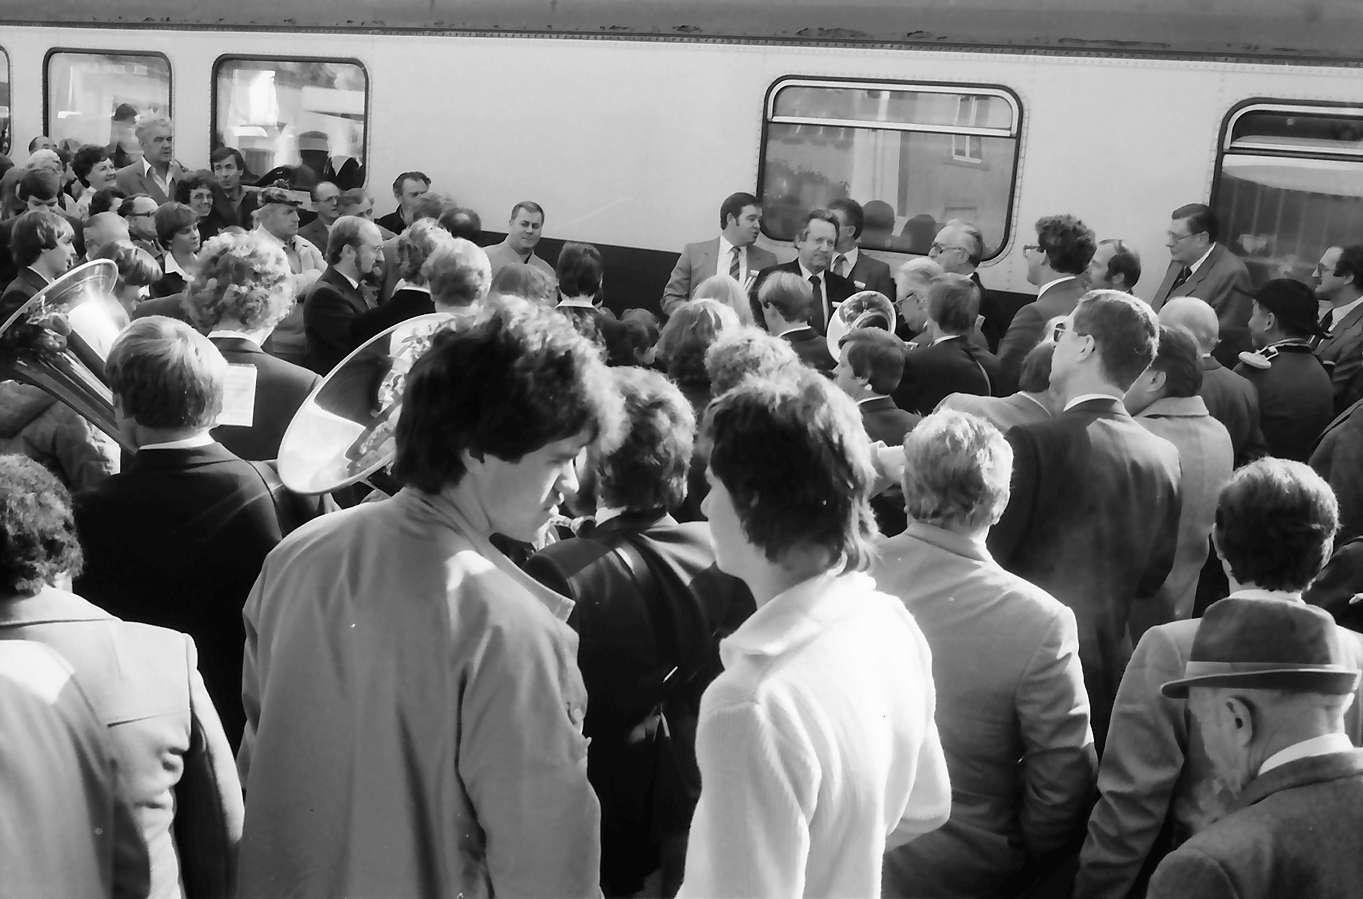 Albbruck: Gruppen; Empfang im Bahnhof, Bild 1